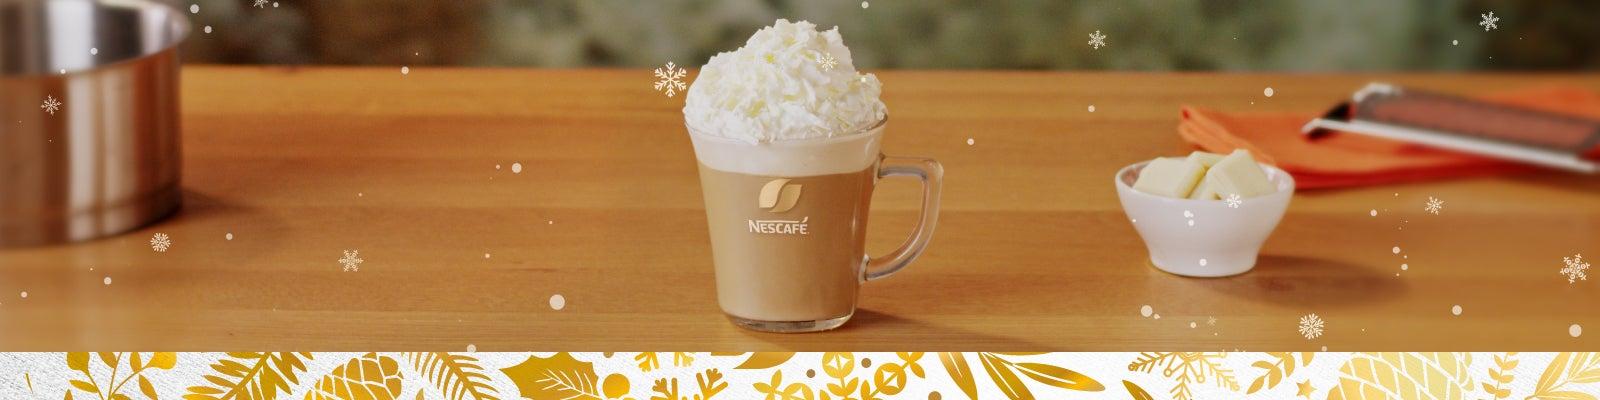 Festive-White-Chocolate-Mocha